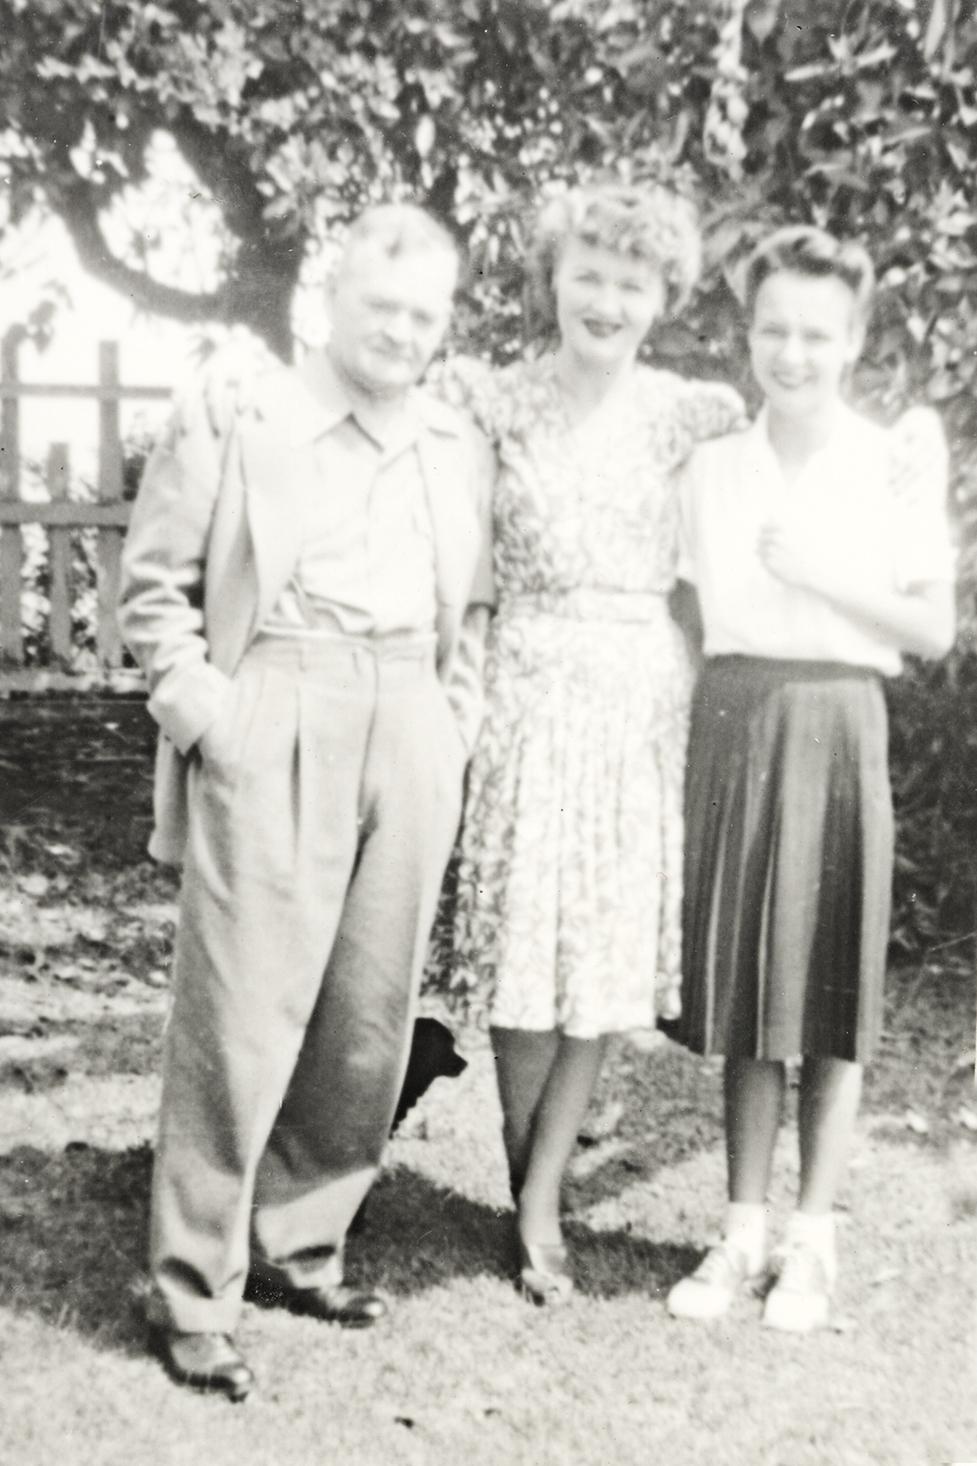 Family Archives - Bijouy